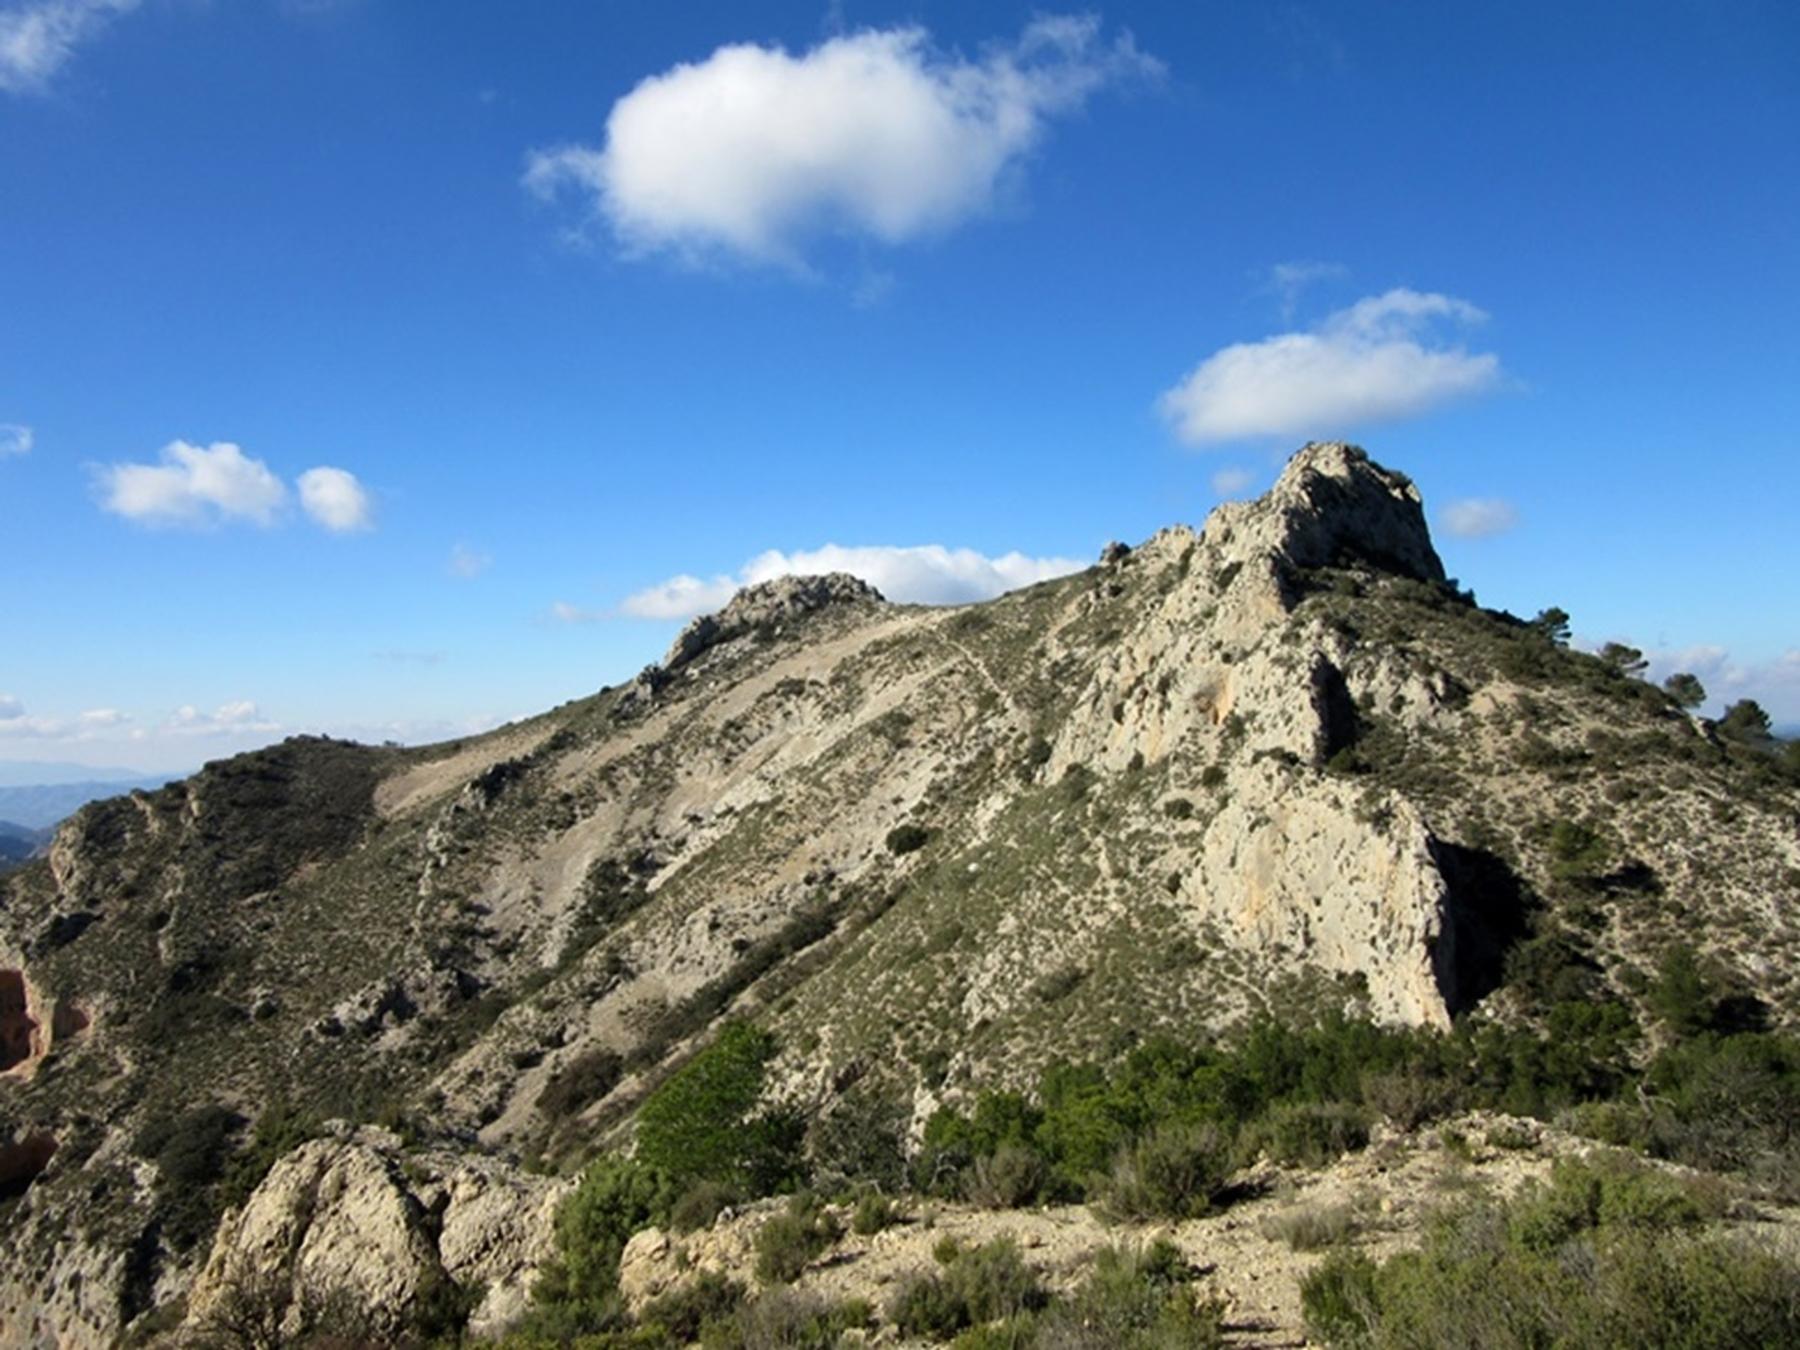 Maigmo Sierra Alicante camping  en España